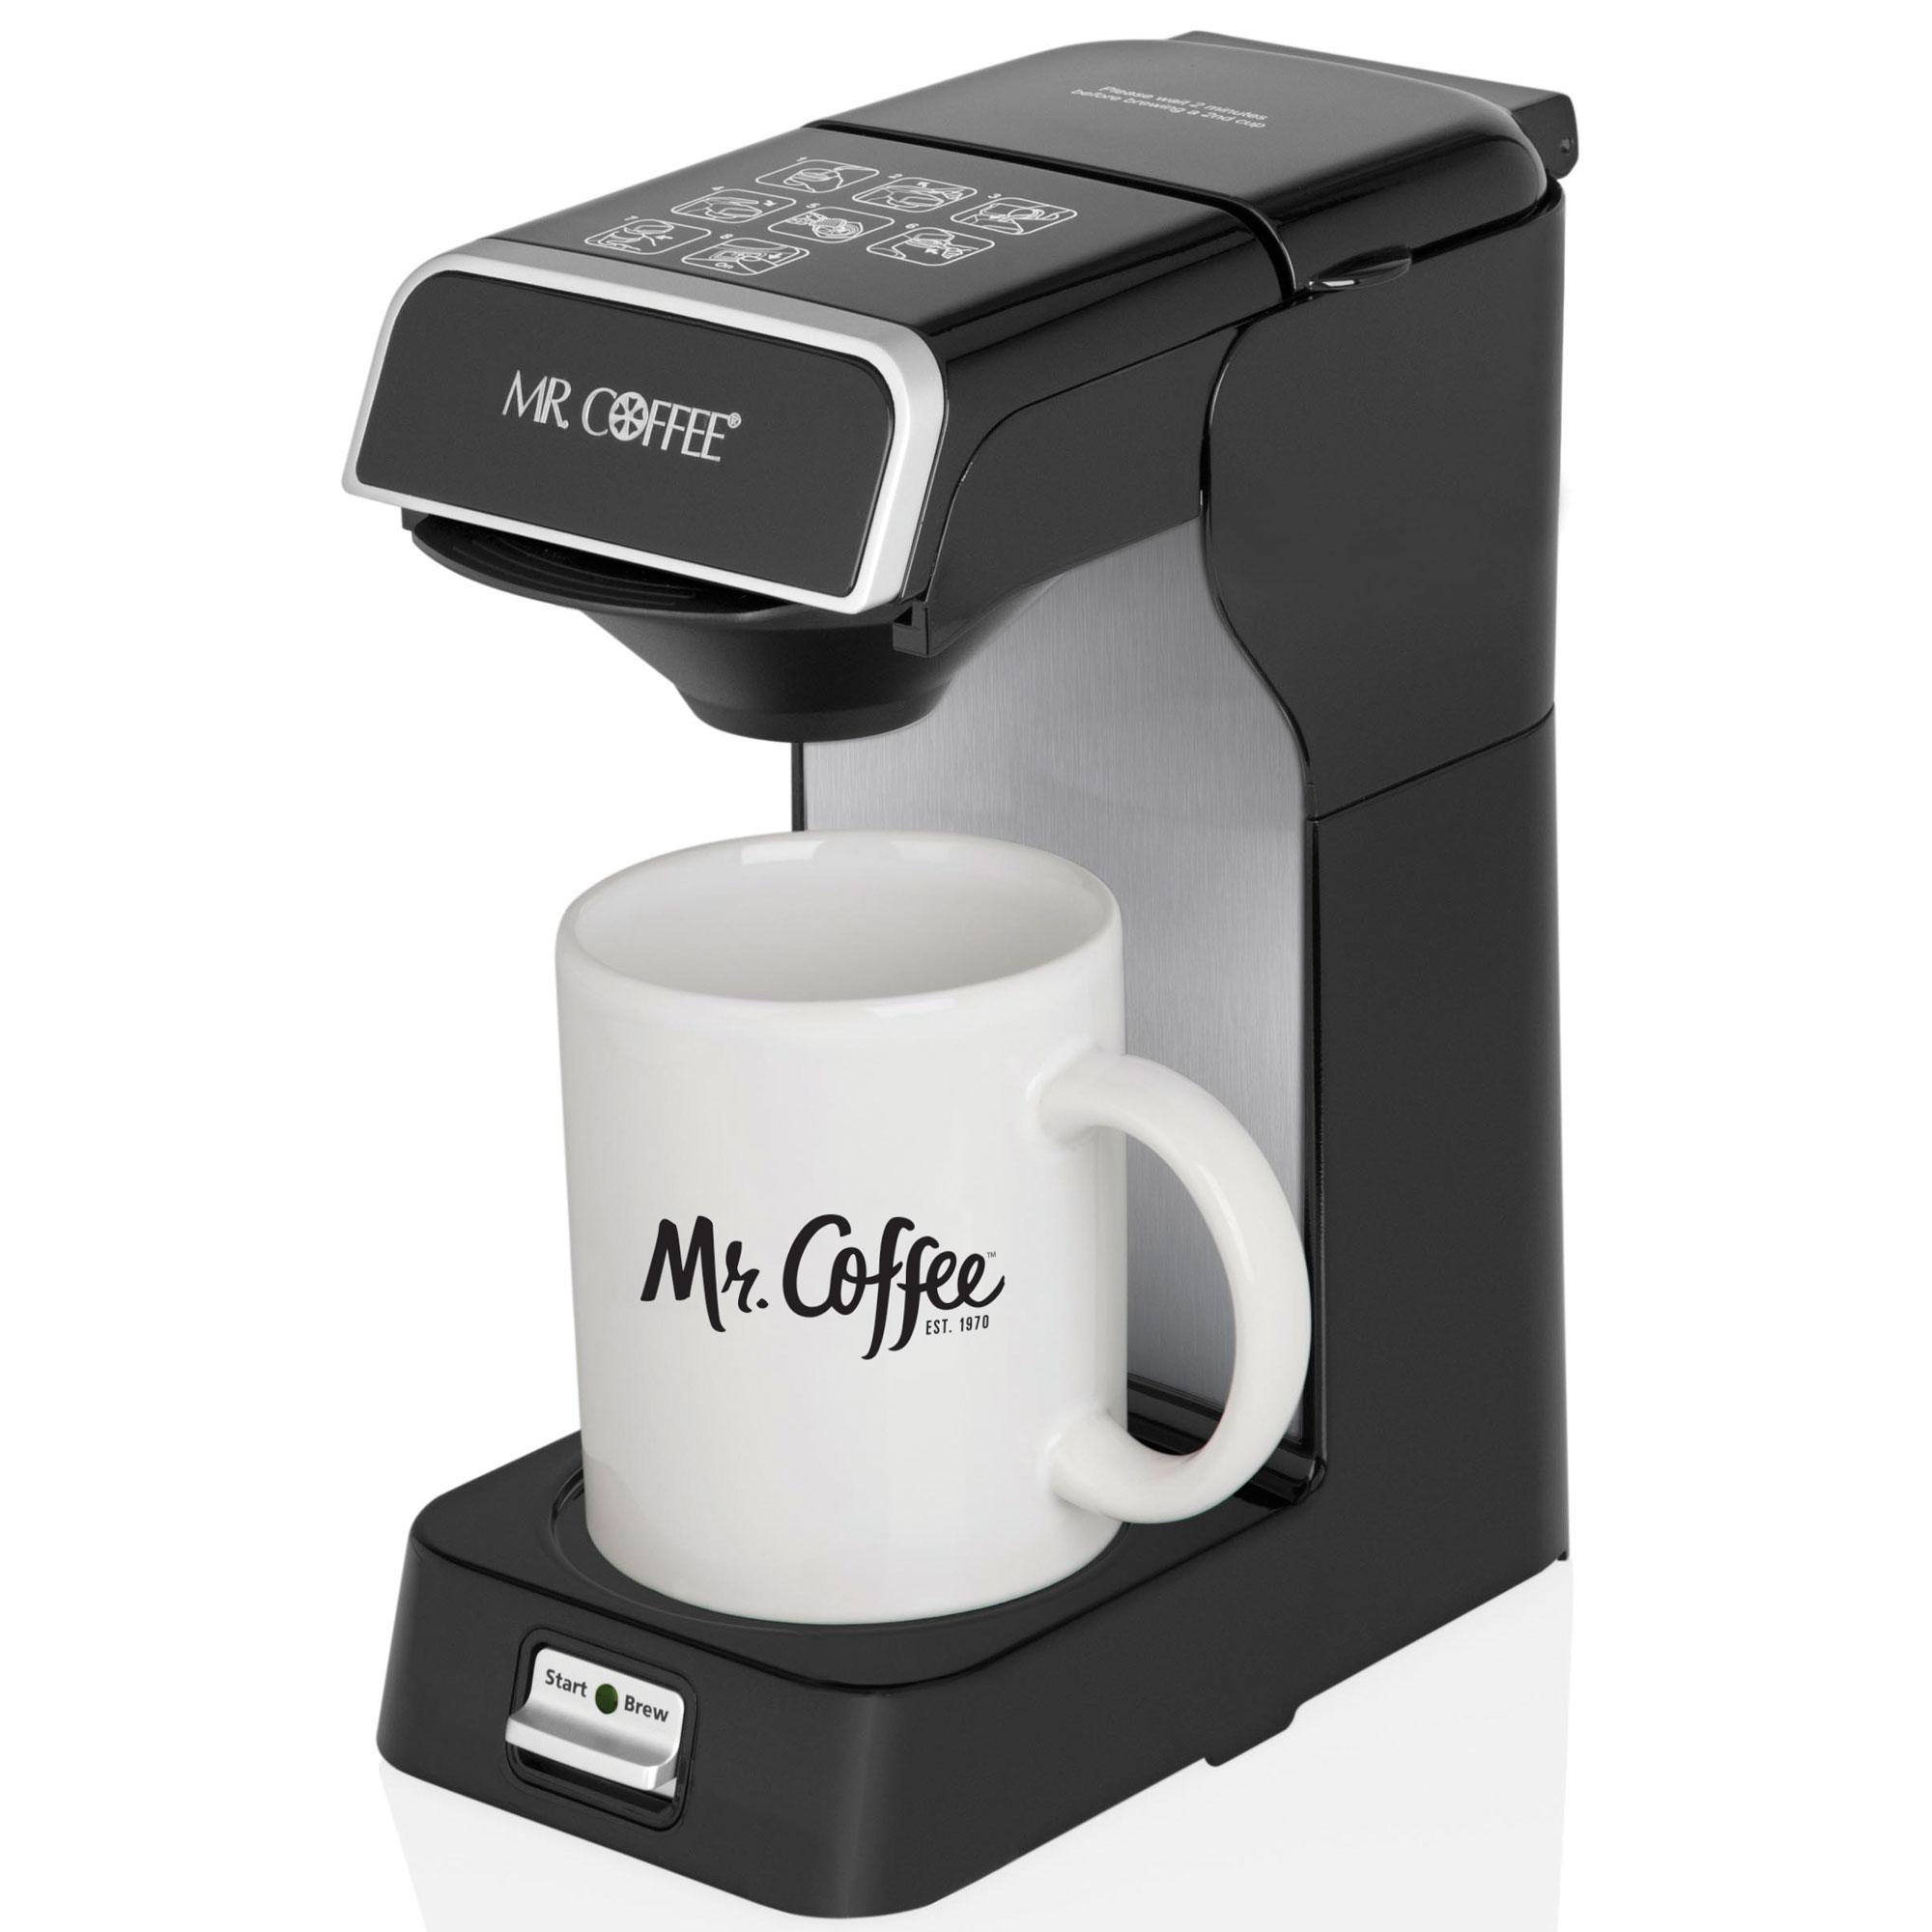 Sunbeam Cm2004005 Mr Coffee Single Serve 1 Cup Coffee